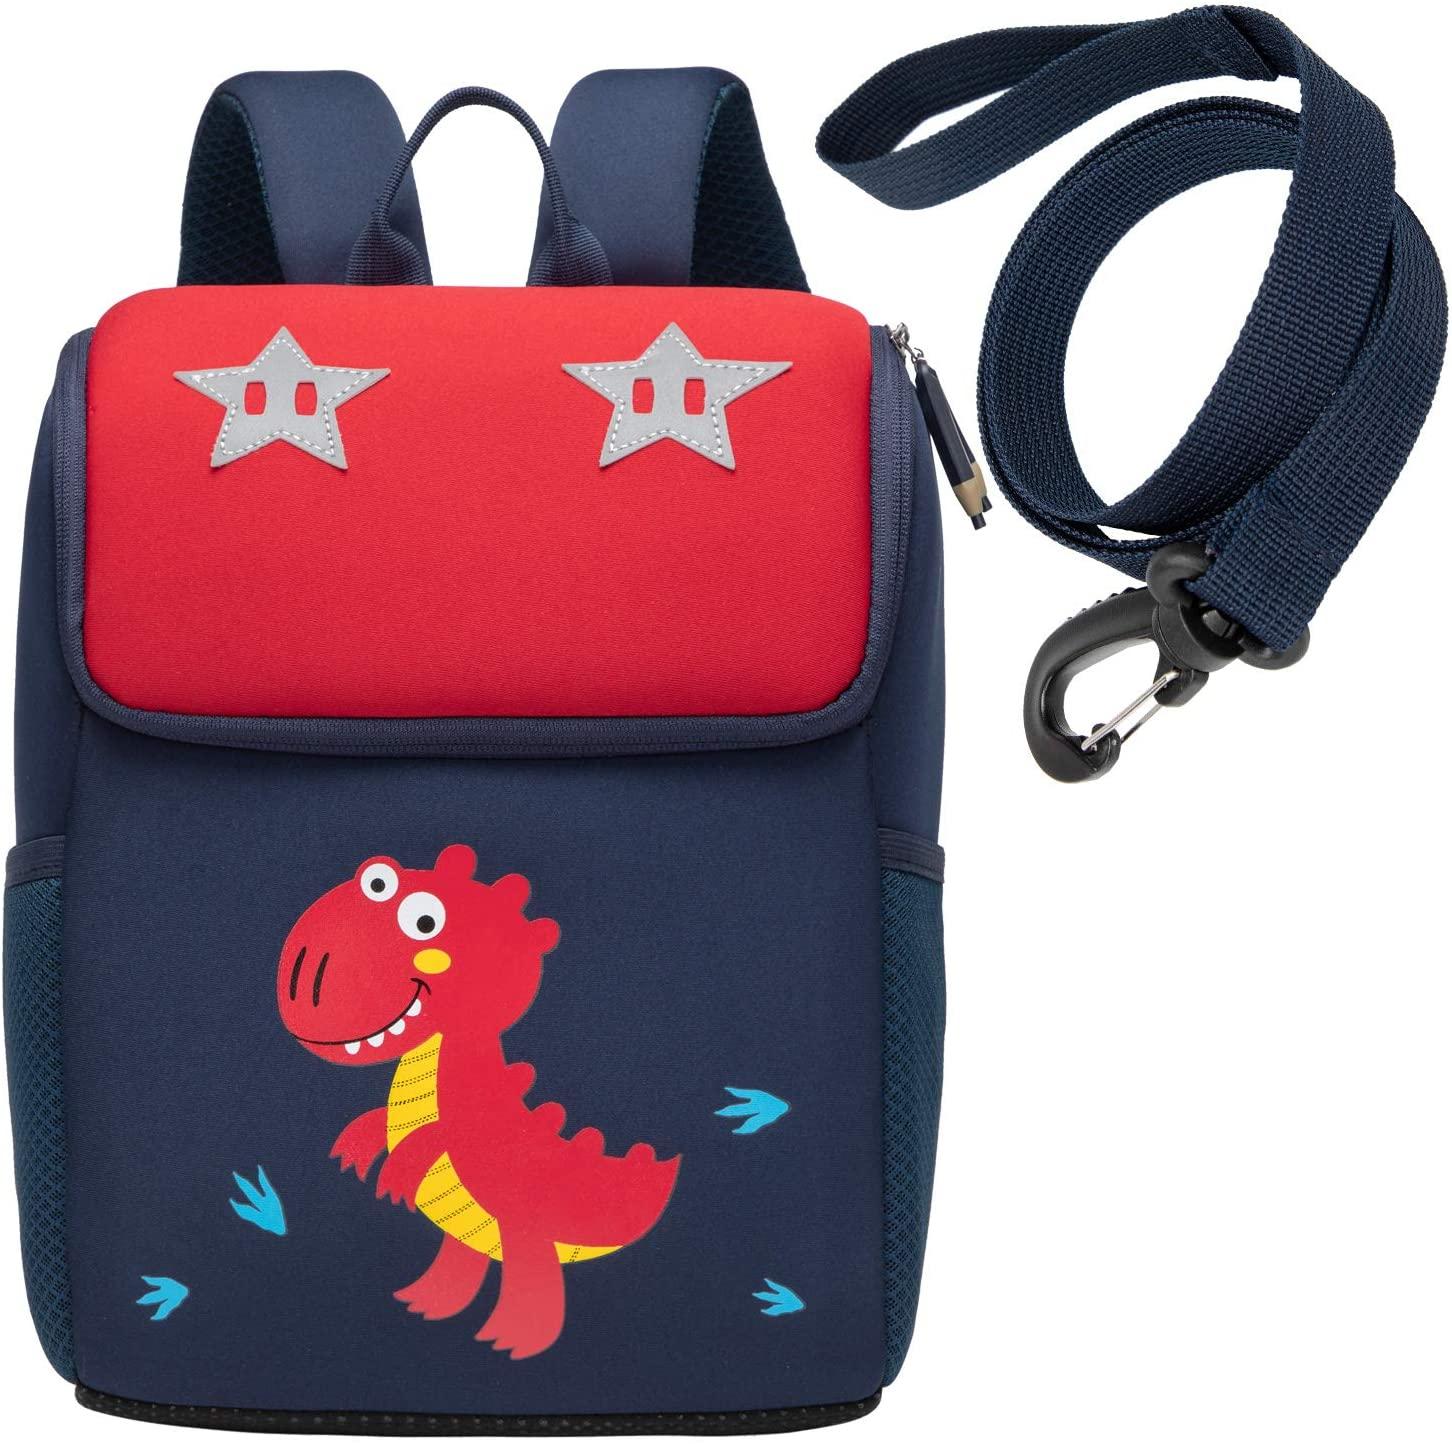 willikiva Kids Toddler Backpack for Boys and Girls Children Dinosaur Preschool Backpack Waterproof Kindergarten Bag Safety Harness Leash (Dinosaur)